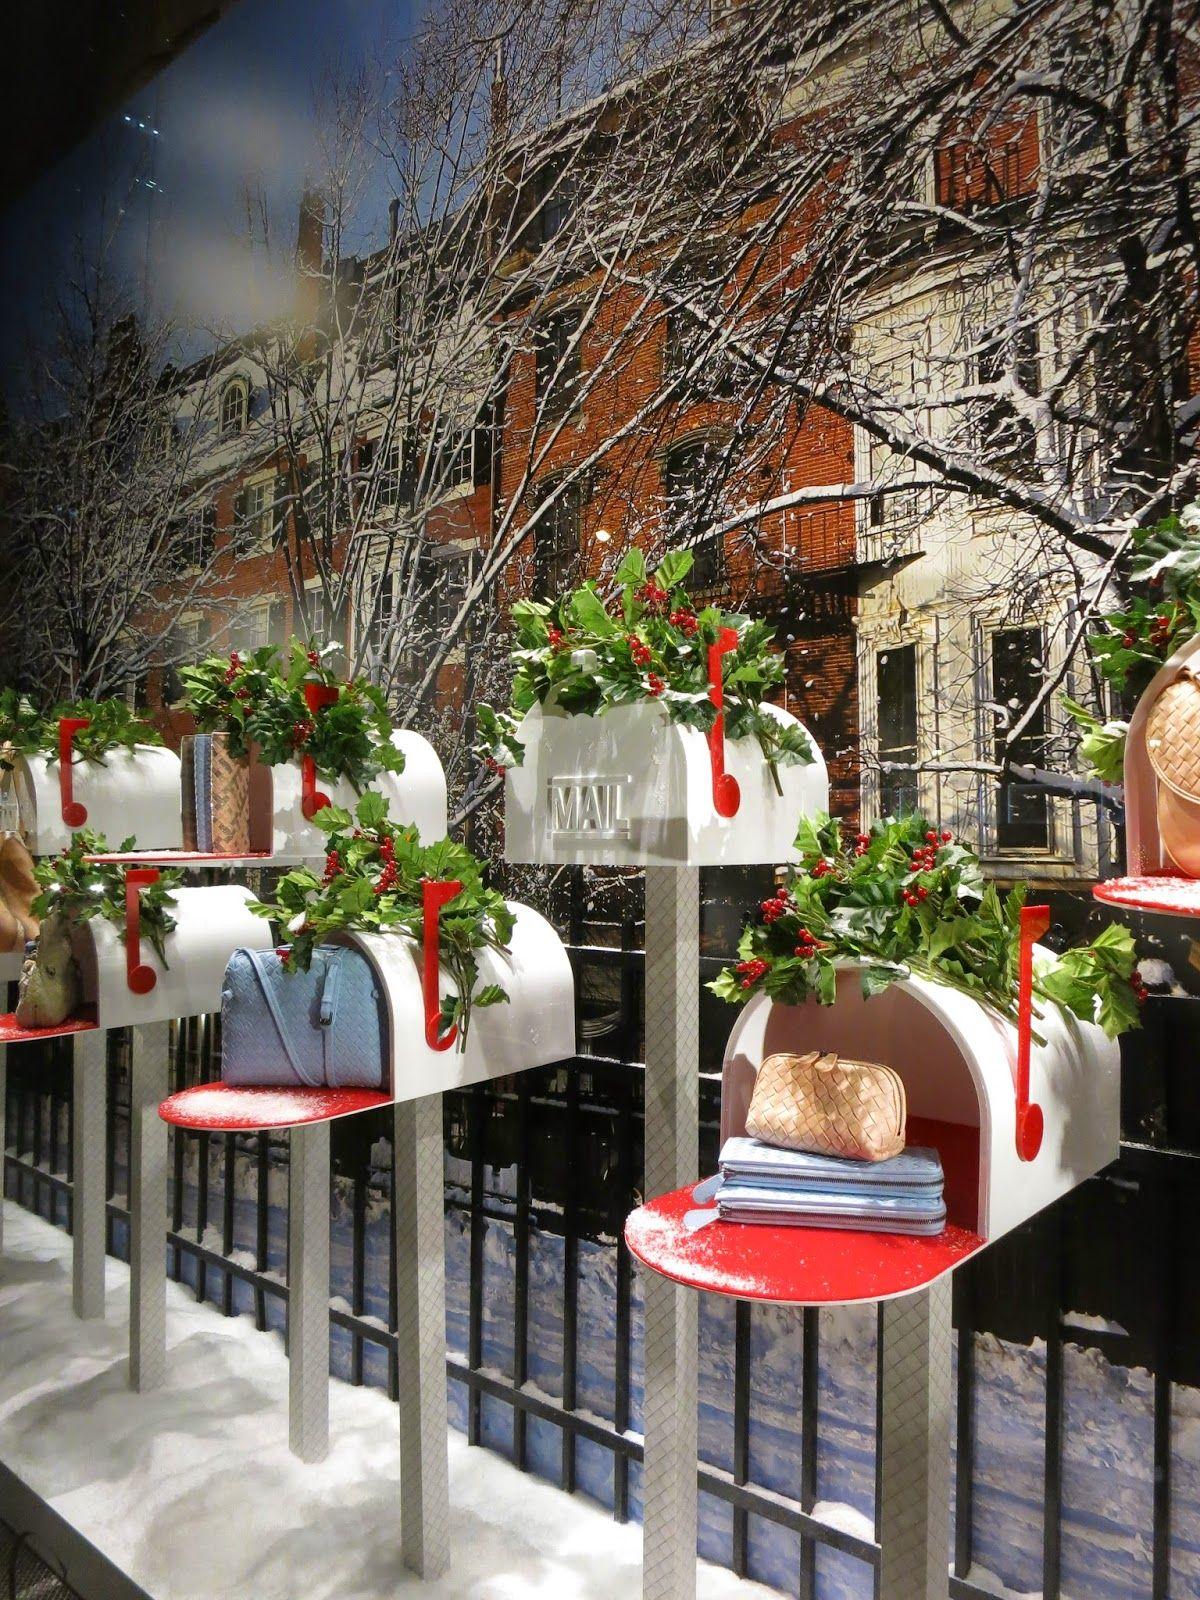 Bottega veneta new york shops pinterest schaufenster schaufensterdekoration und - Schaufensterdekoration weihnachten ...